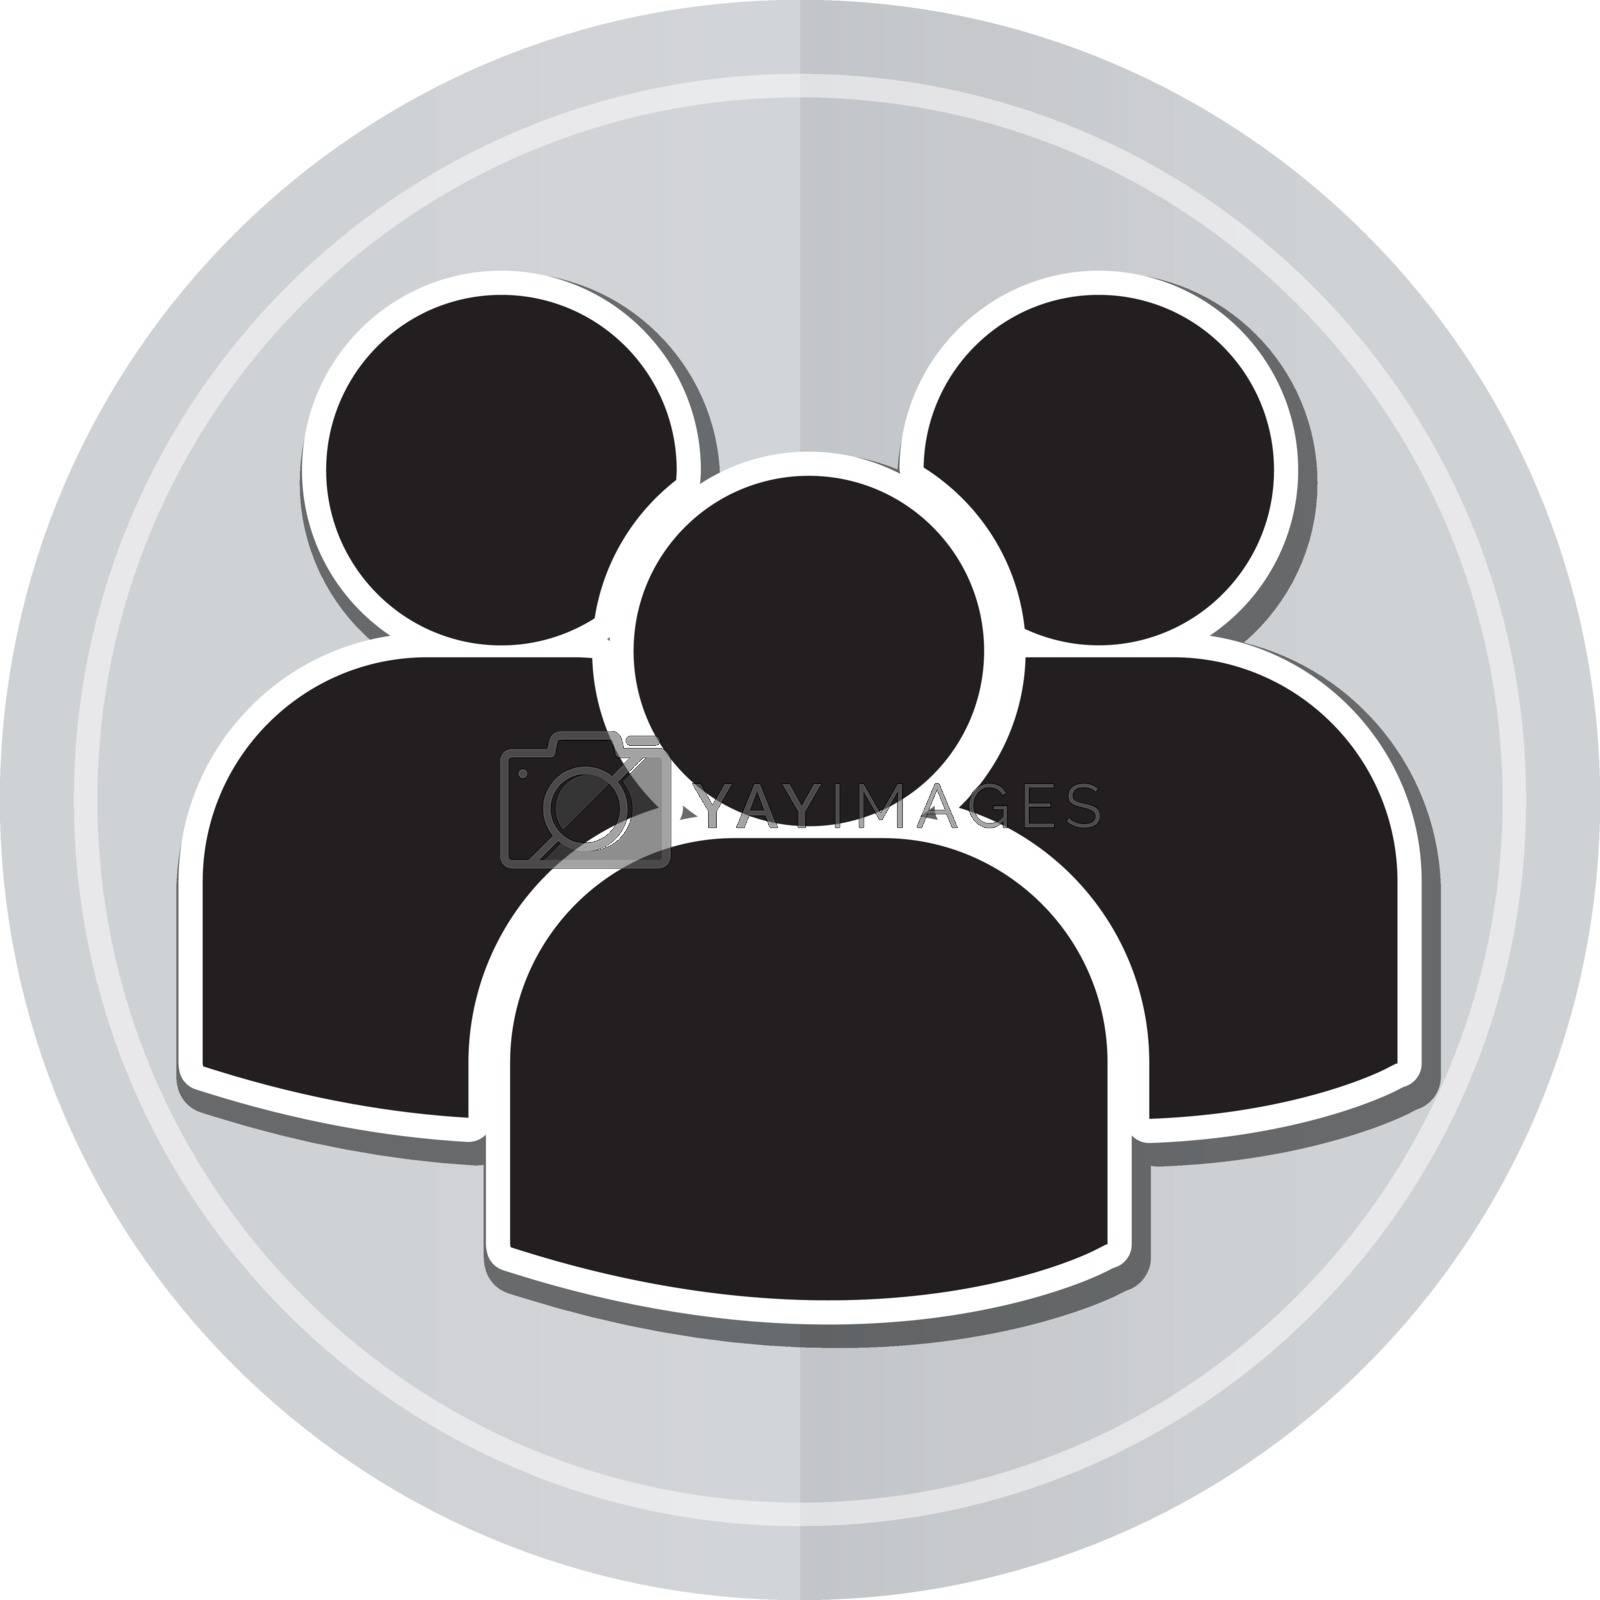 Illustration of team sticker icon simple design